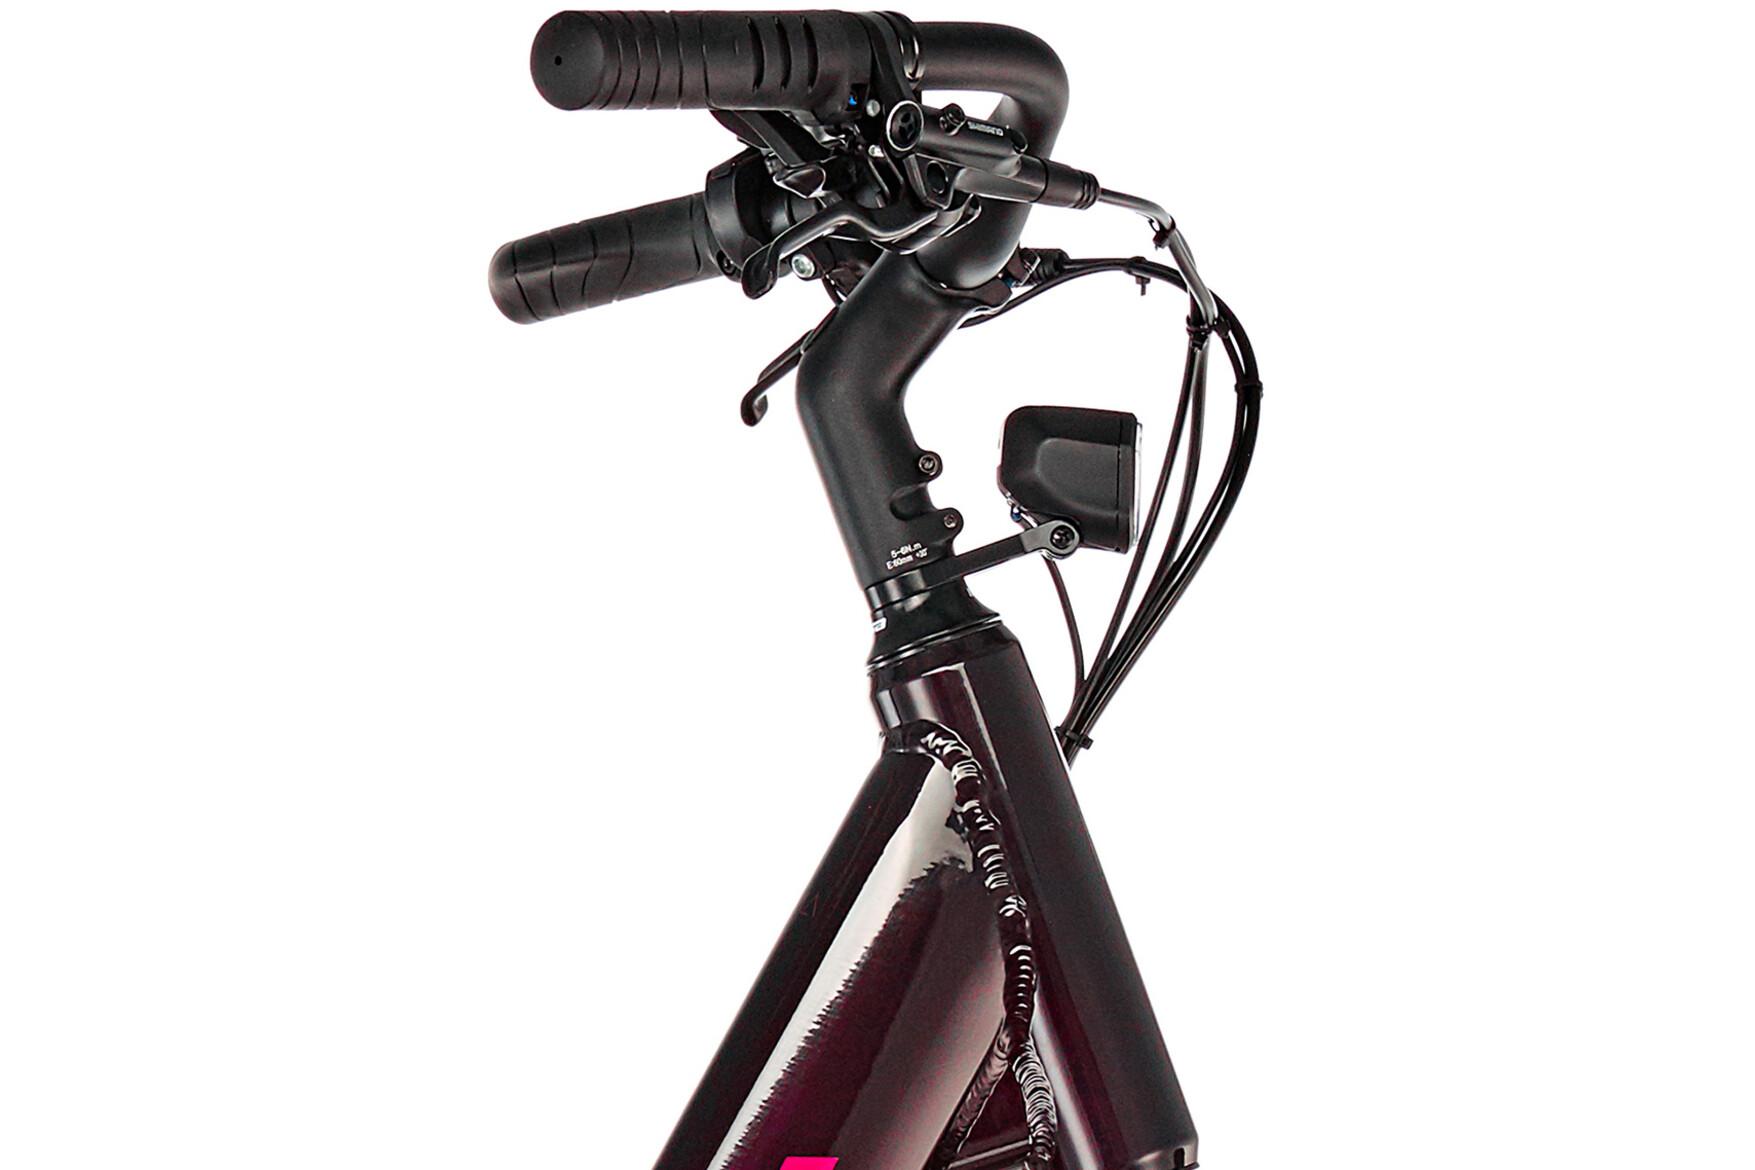 762b7dbcde1 ORBEA Optima E40 E-City Bike purple at Bikester.co.uk